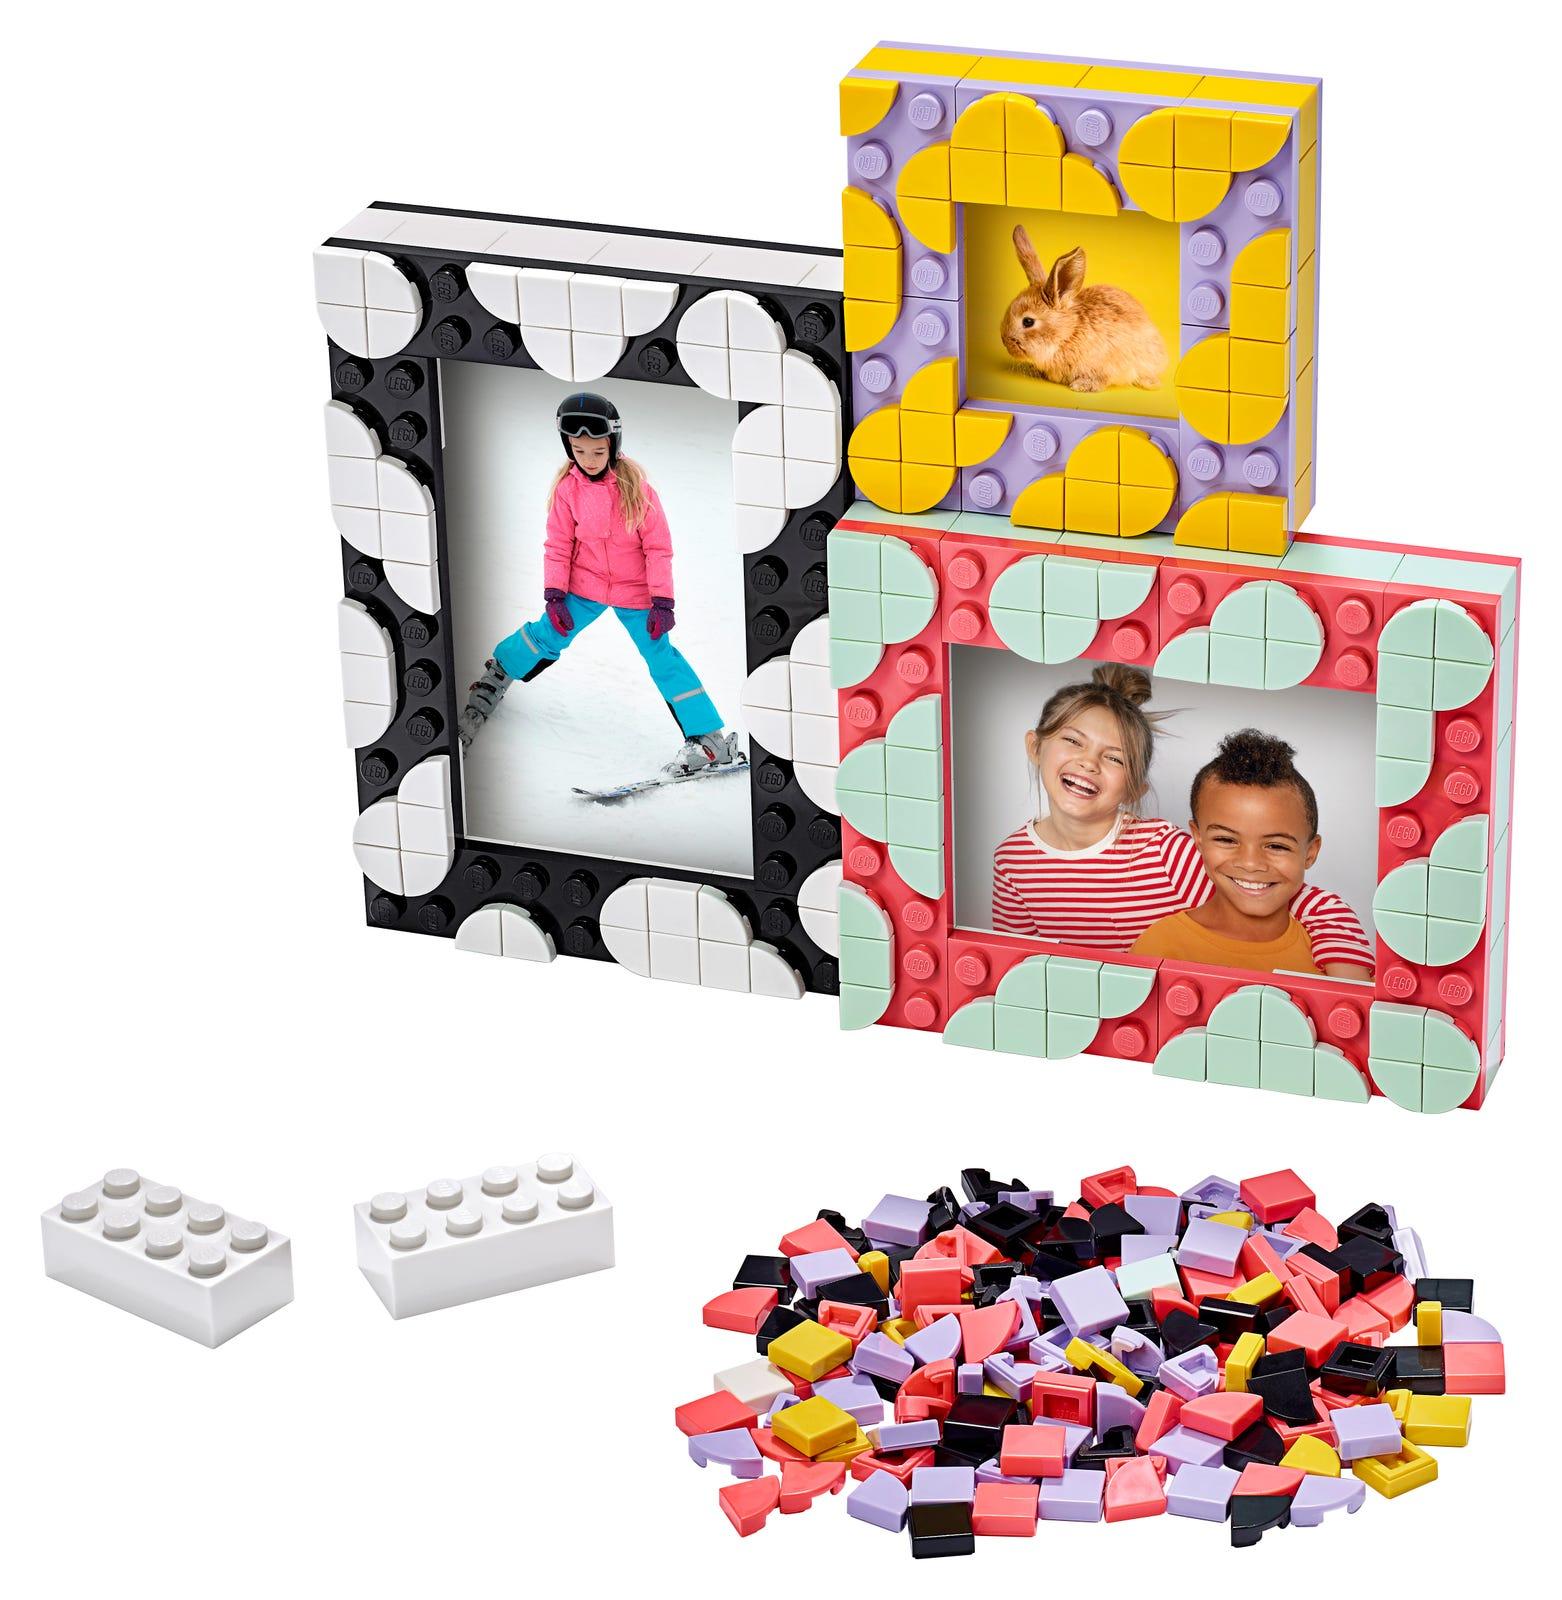 Various Lego sets half price in Morrison's (Kirkstall) - E.G Lego 41914 Dots frames £8